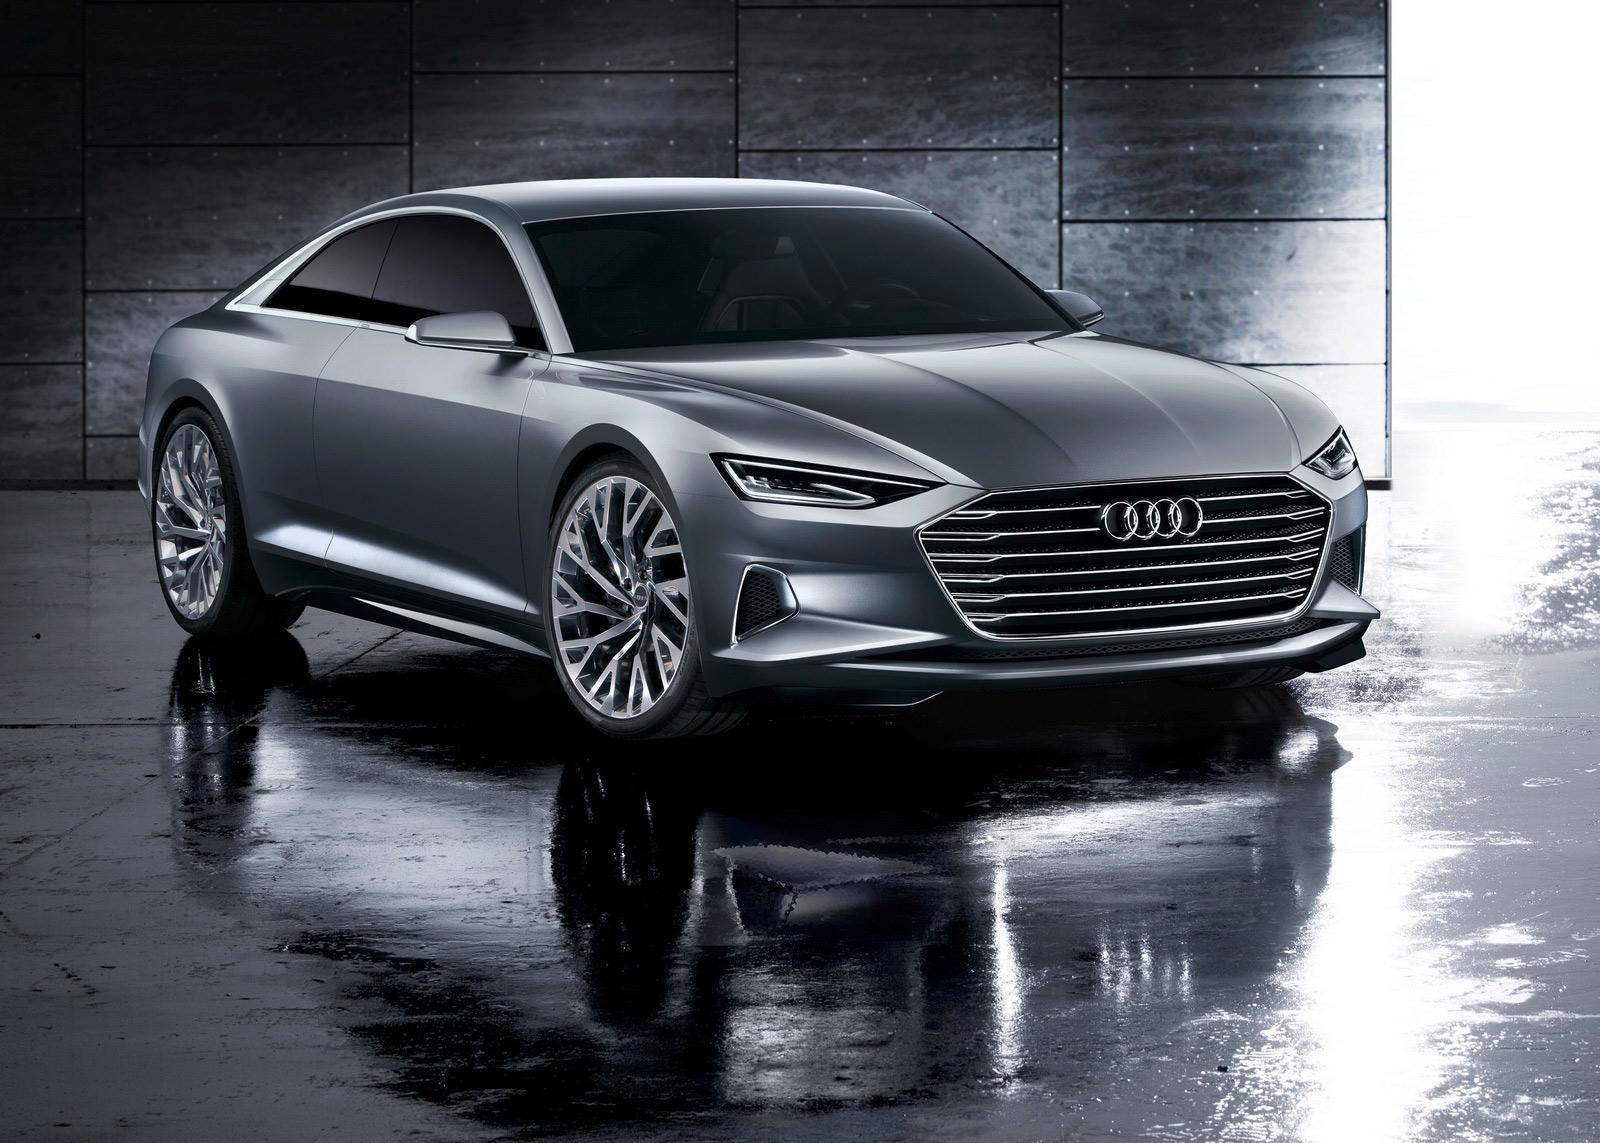 Audi electric concept